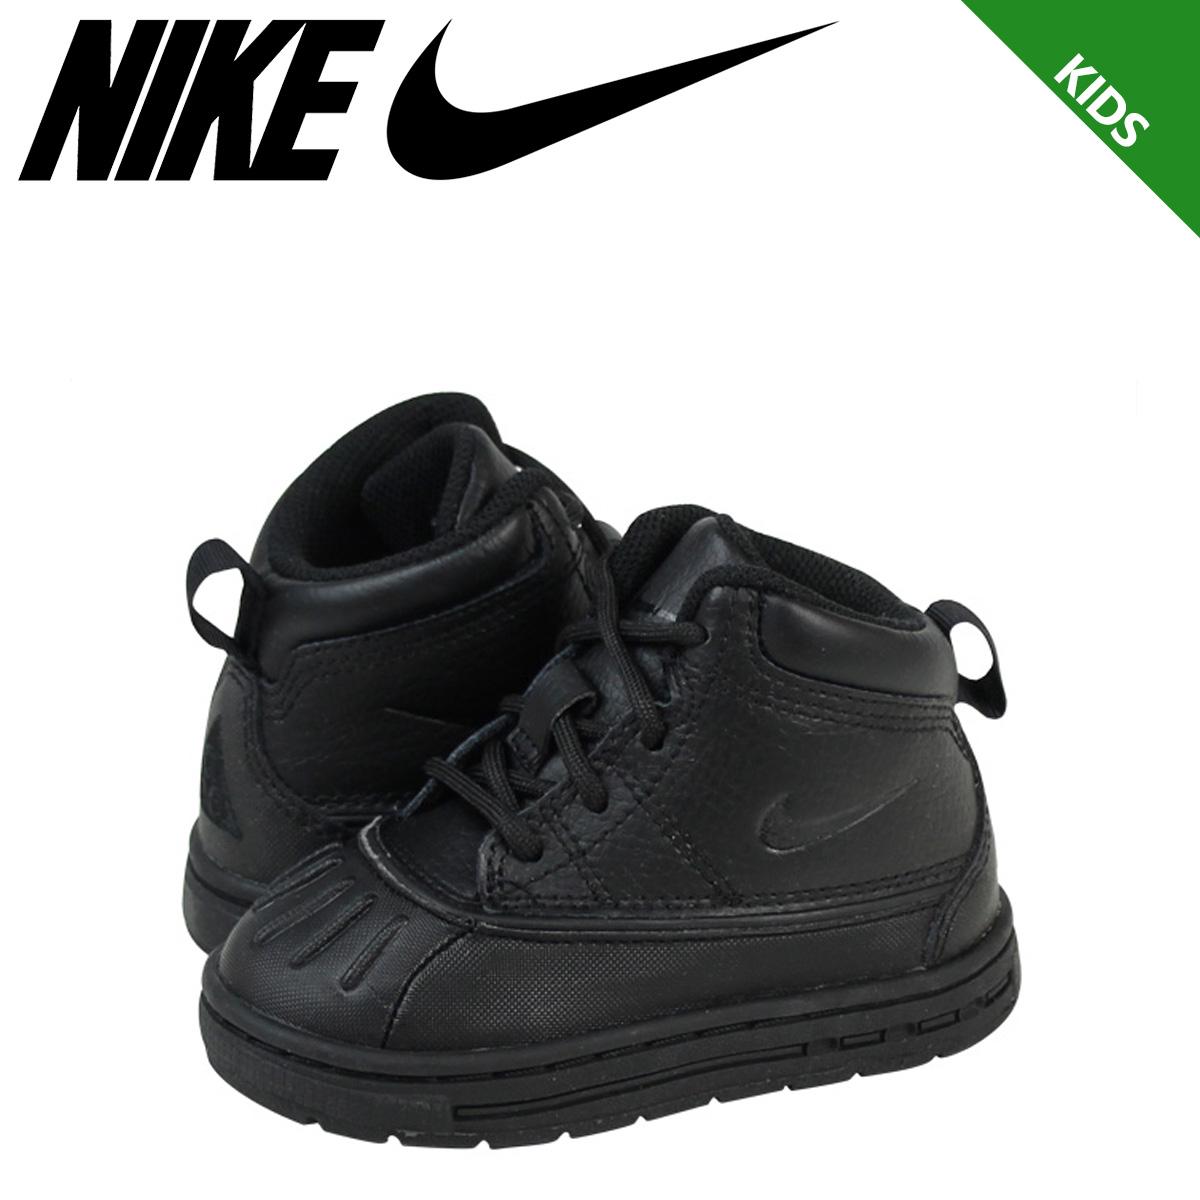 Black//Black BOYS NIKE WOODSIDE 2 HIGH 524872 001 GS